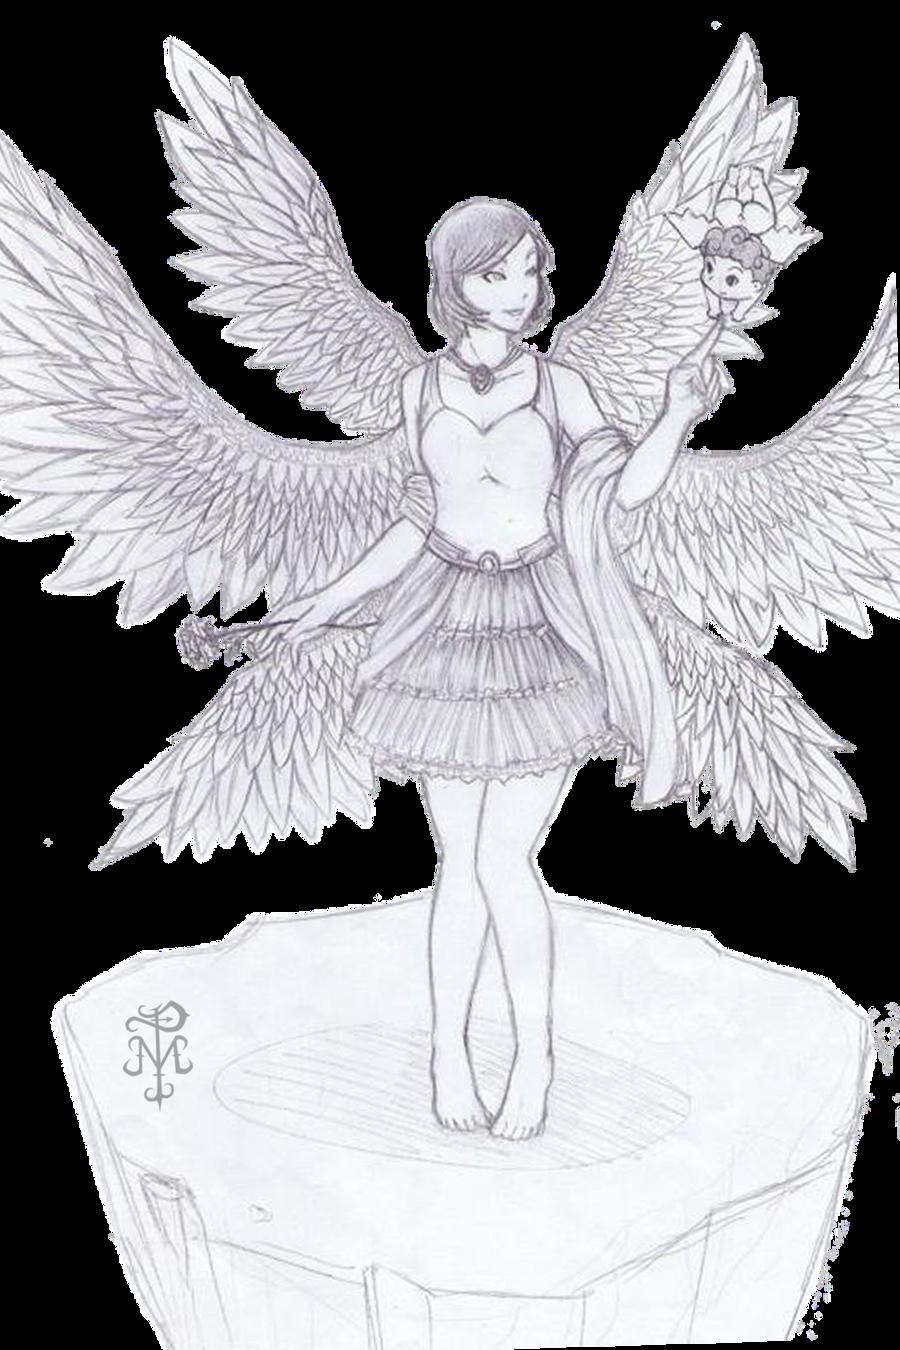 6 winged angel by markprincipe on DeviantArt